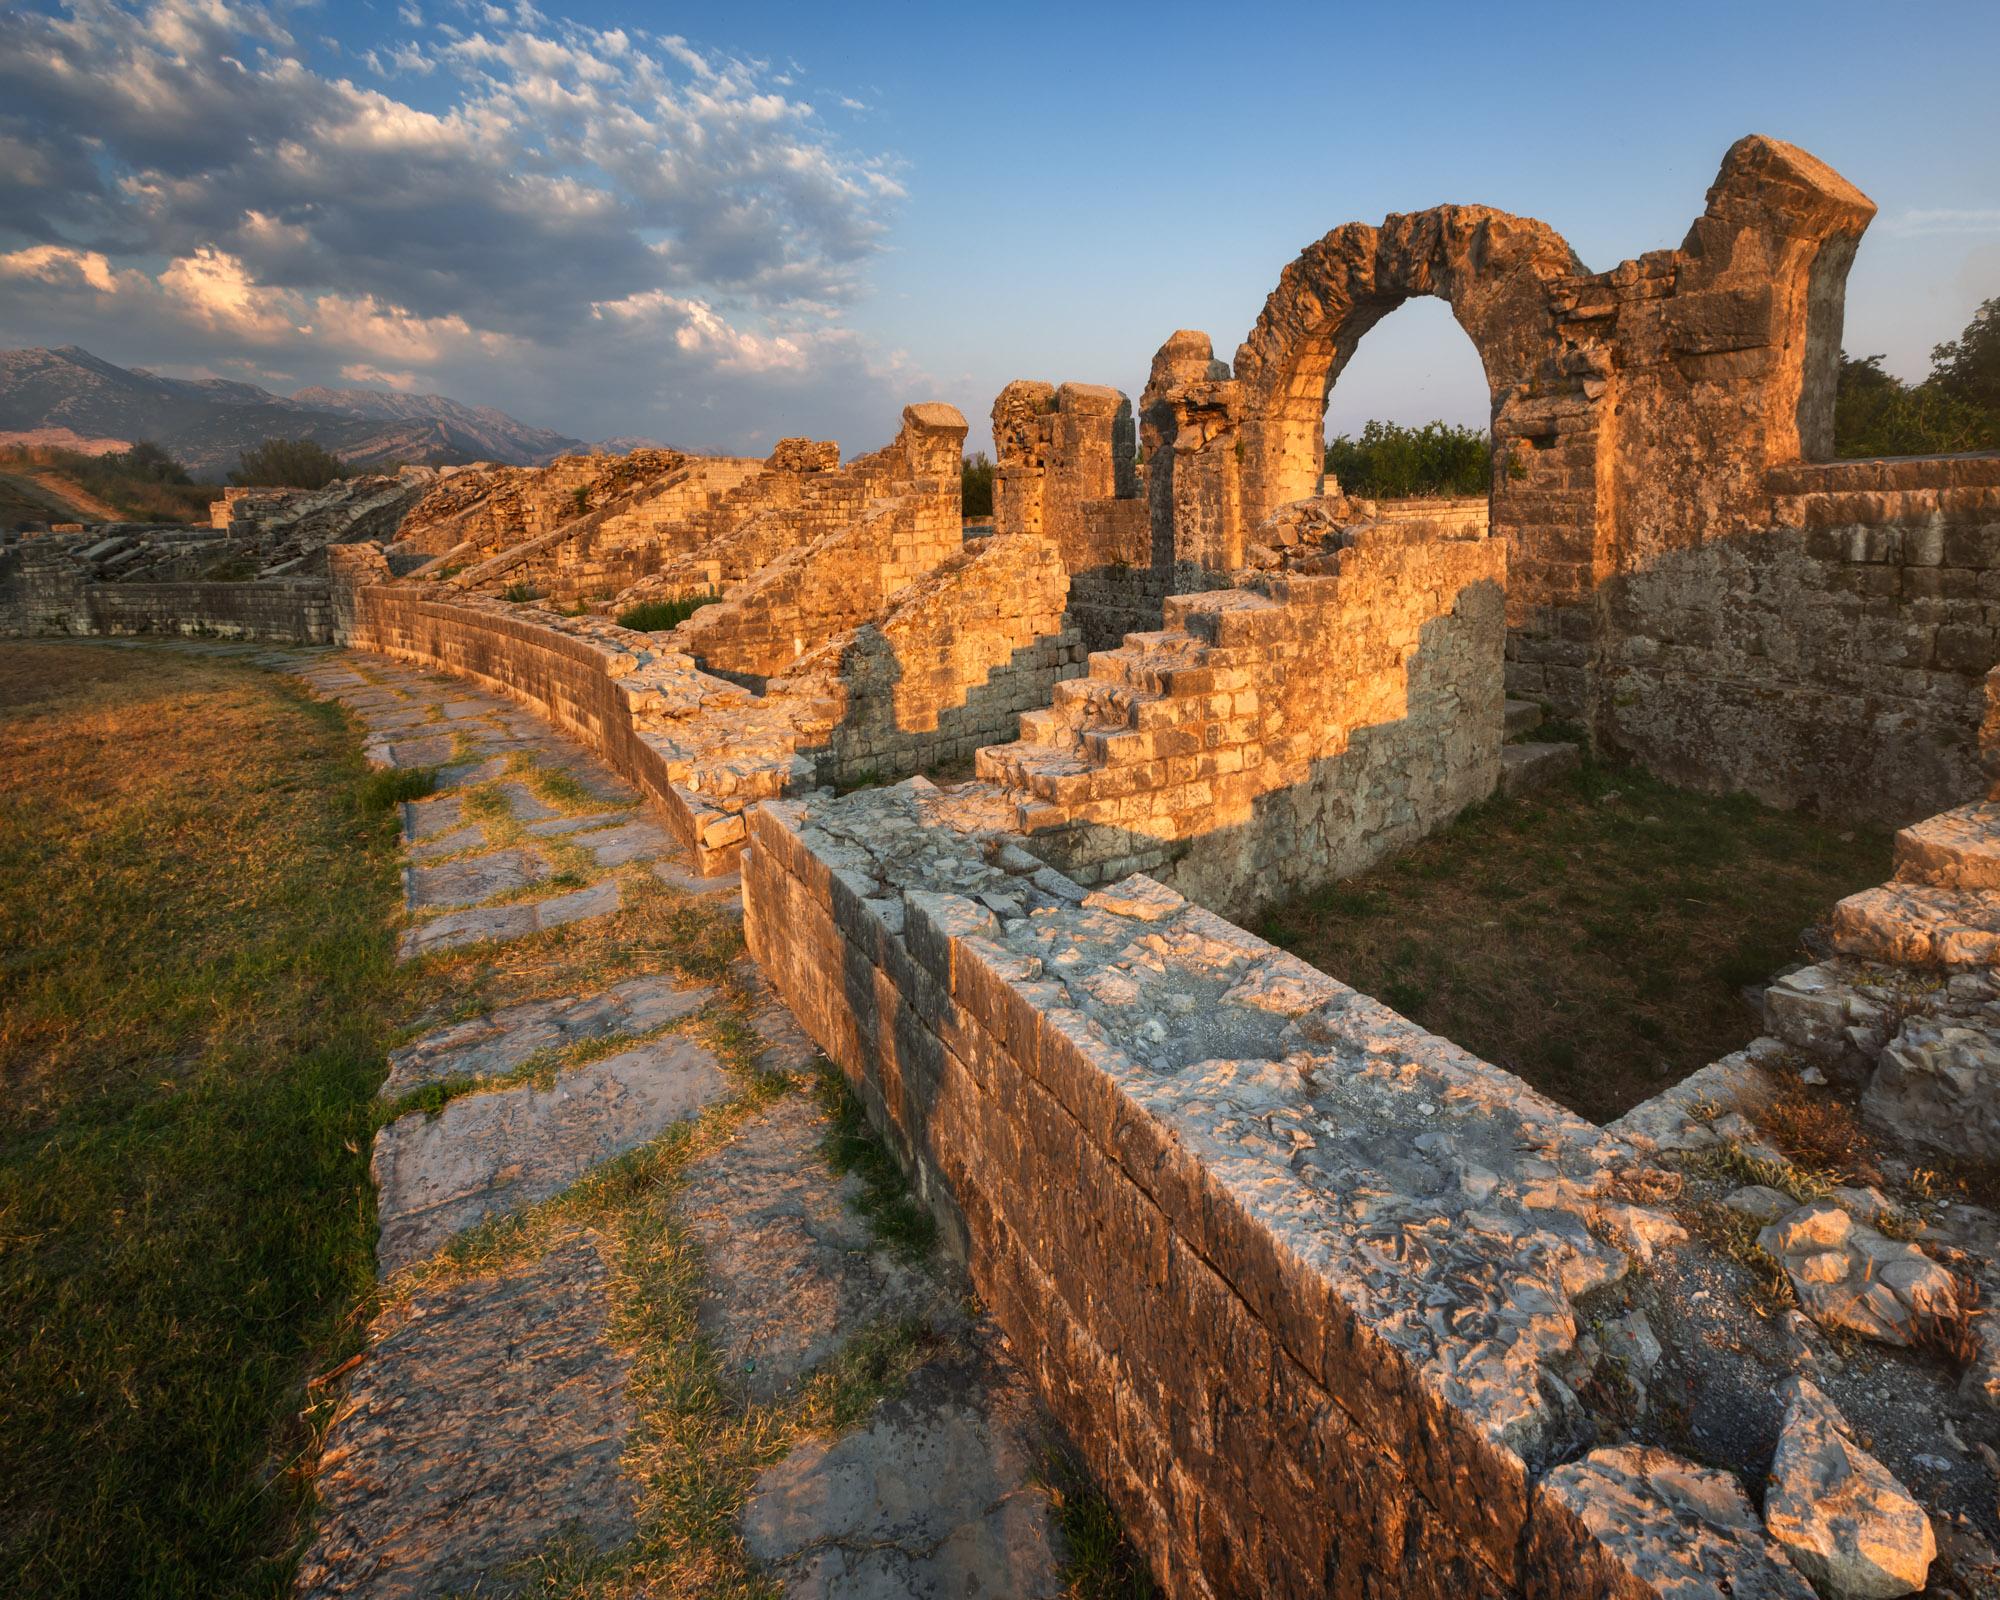 Roman Ampitheater Ruins in Salona, Split, Croatia